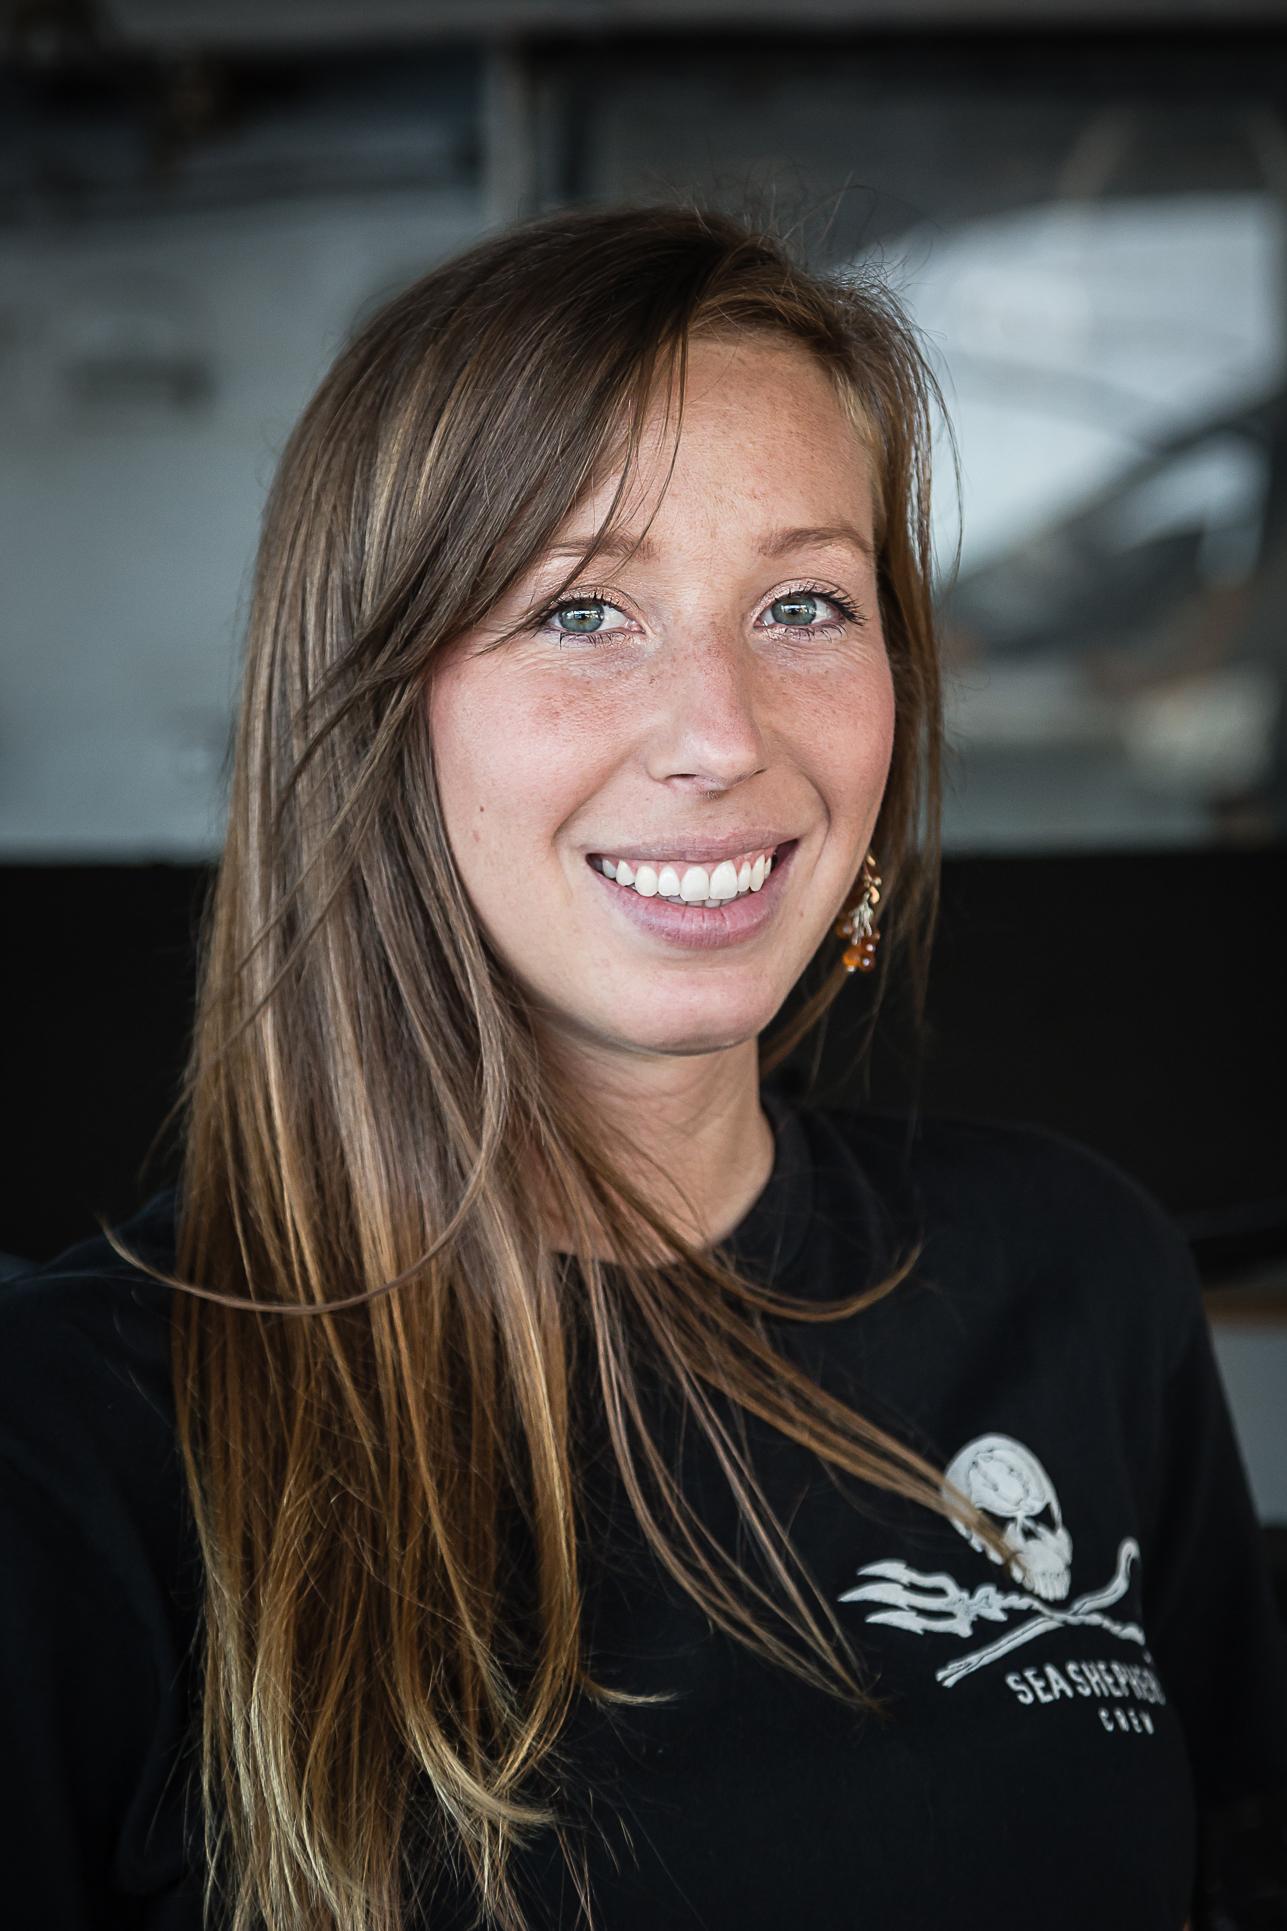 Katie's Sea Shepherd crew mug shot